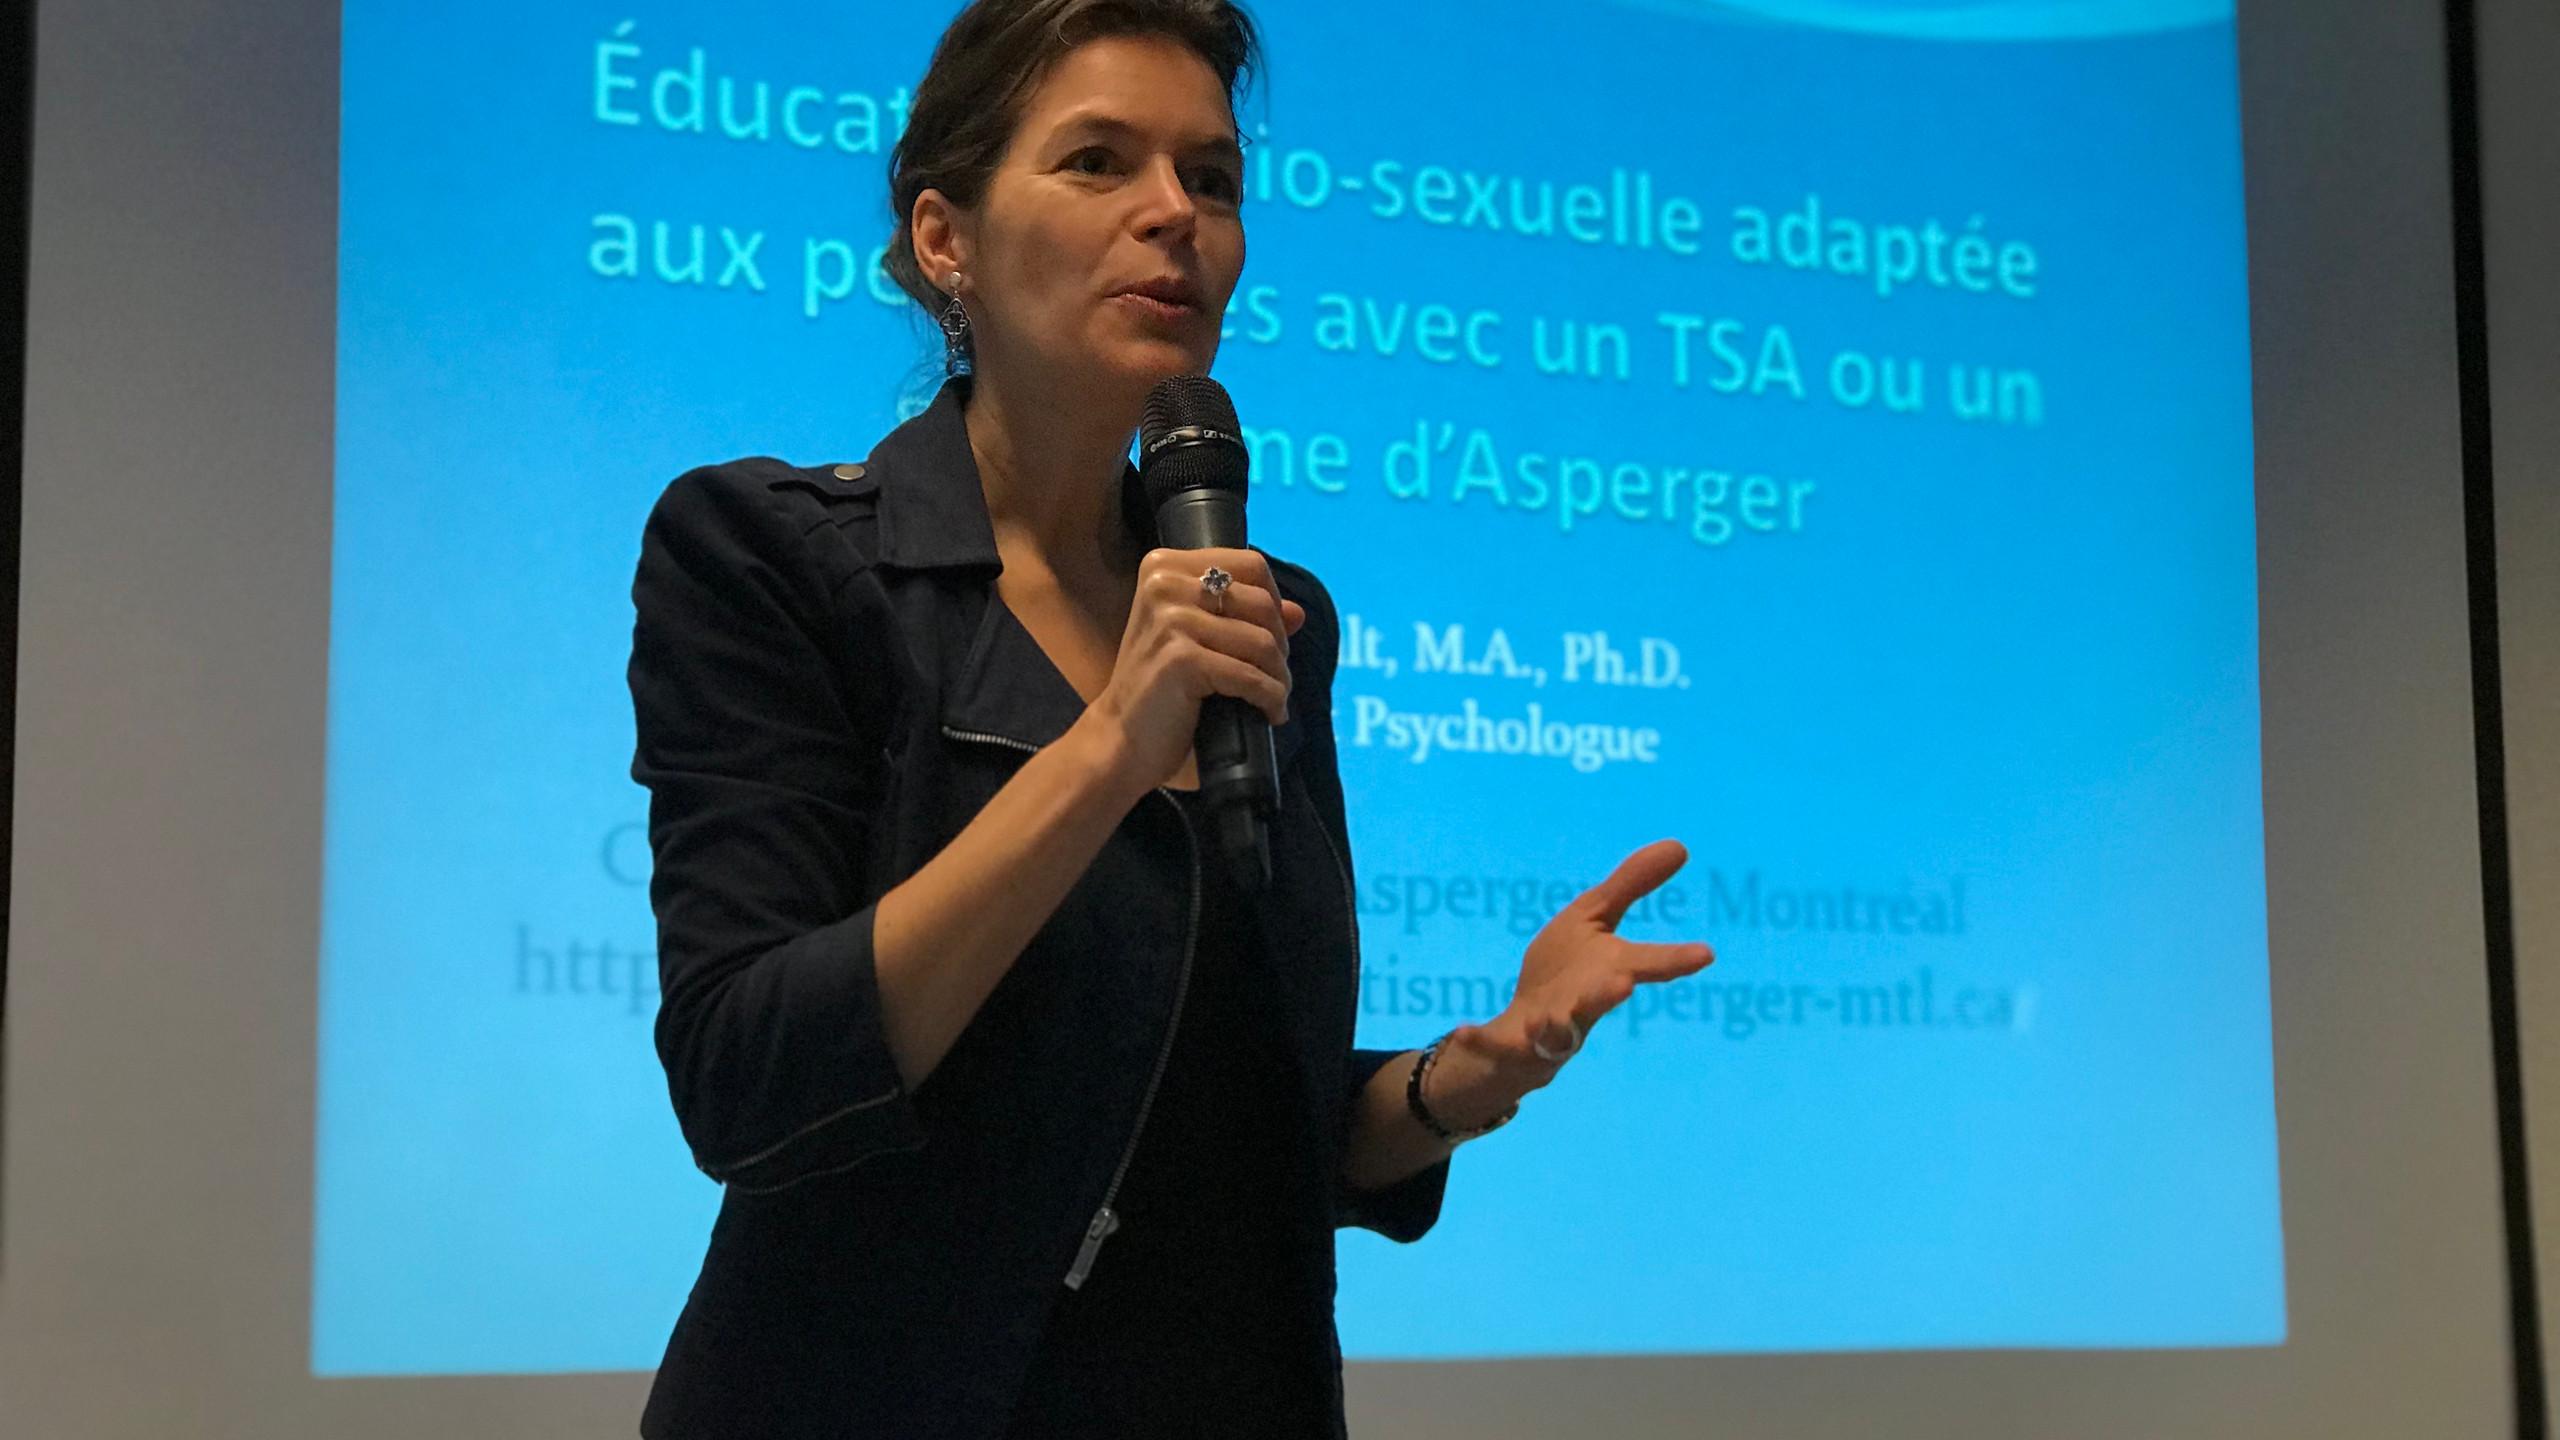 Dott.ssa Hénault durante conferenza